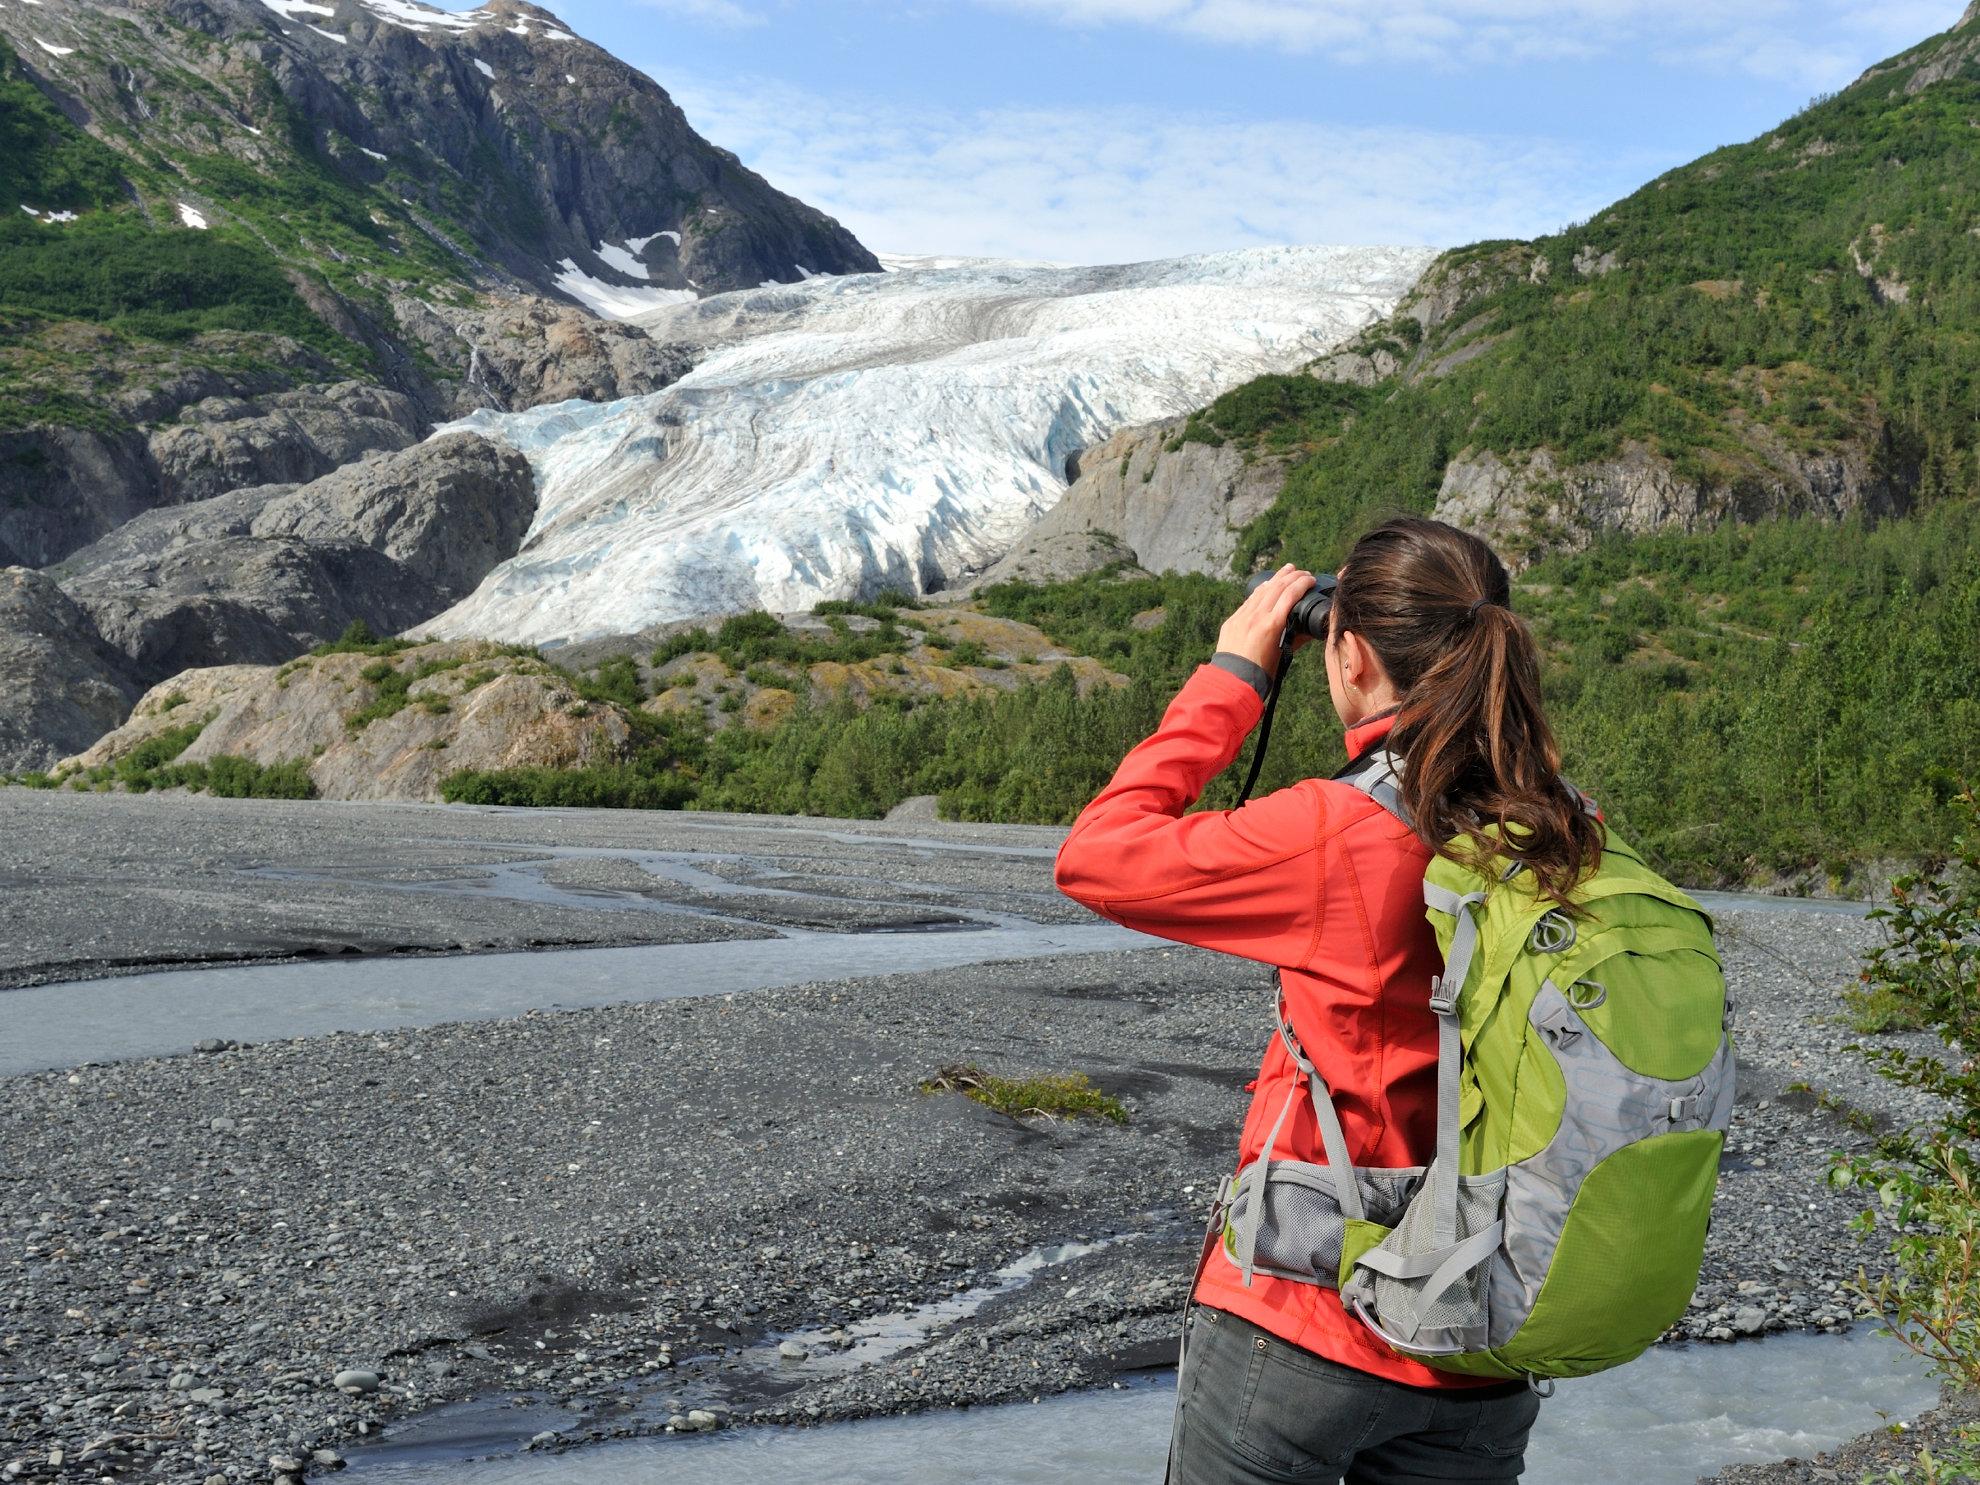 Girl at glacier Alaska